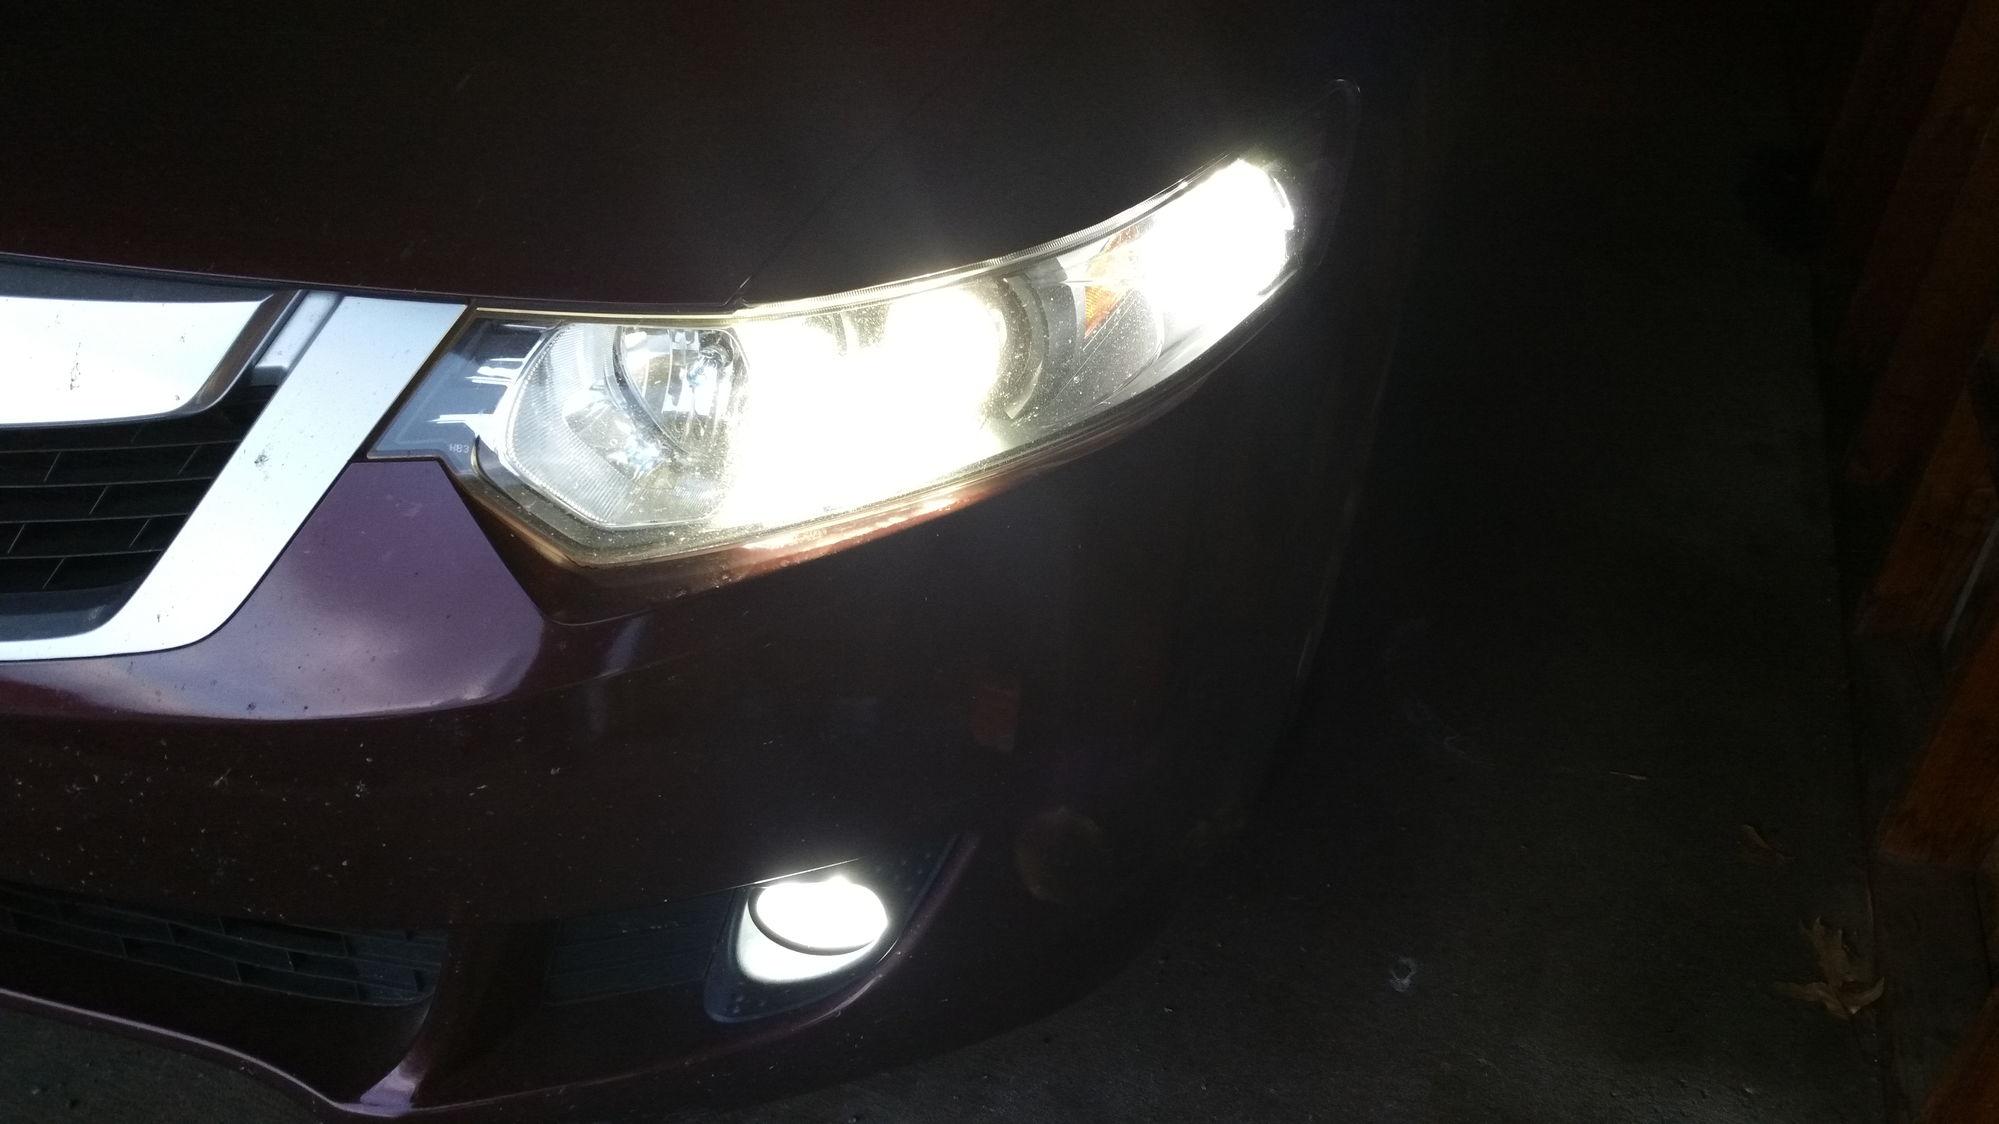 Turn signal LEDs - AcuraZine - Acura Enthusiast Community